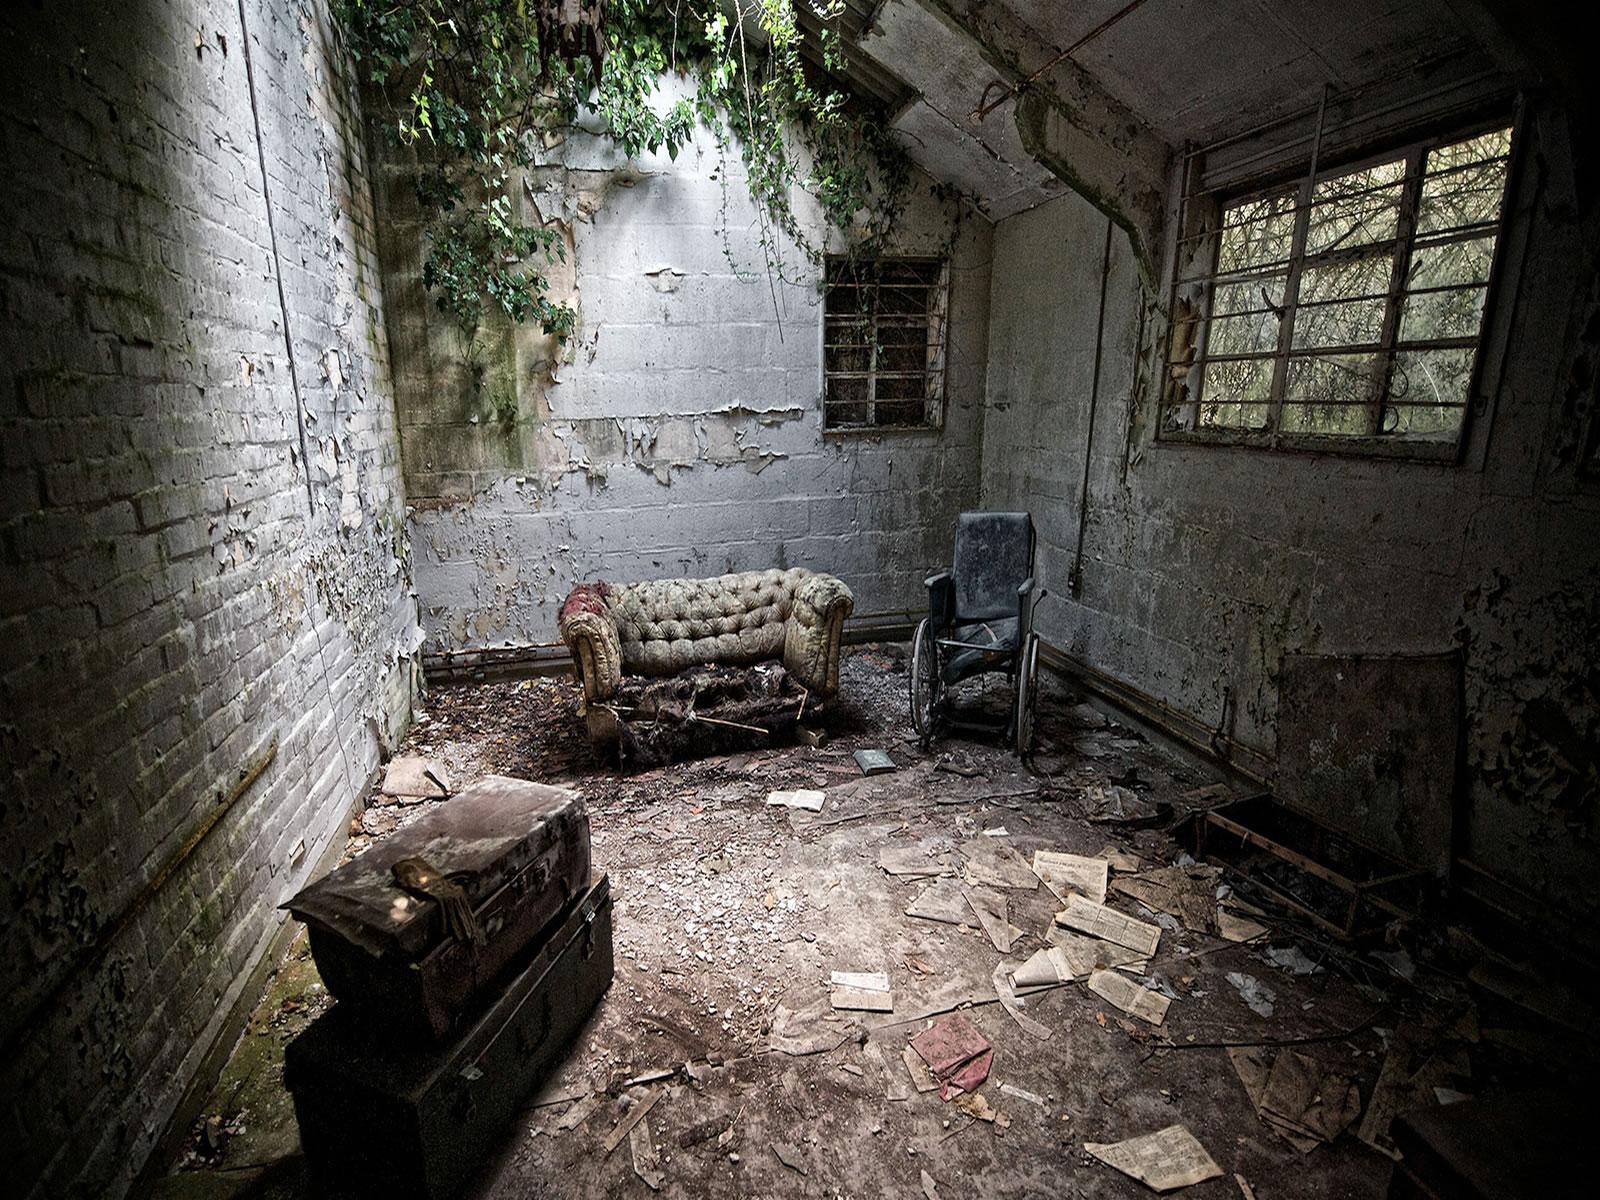 V design de interiores e decora o casas abandonadas - Casas antiguas por dentro ...